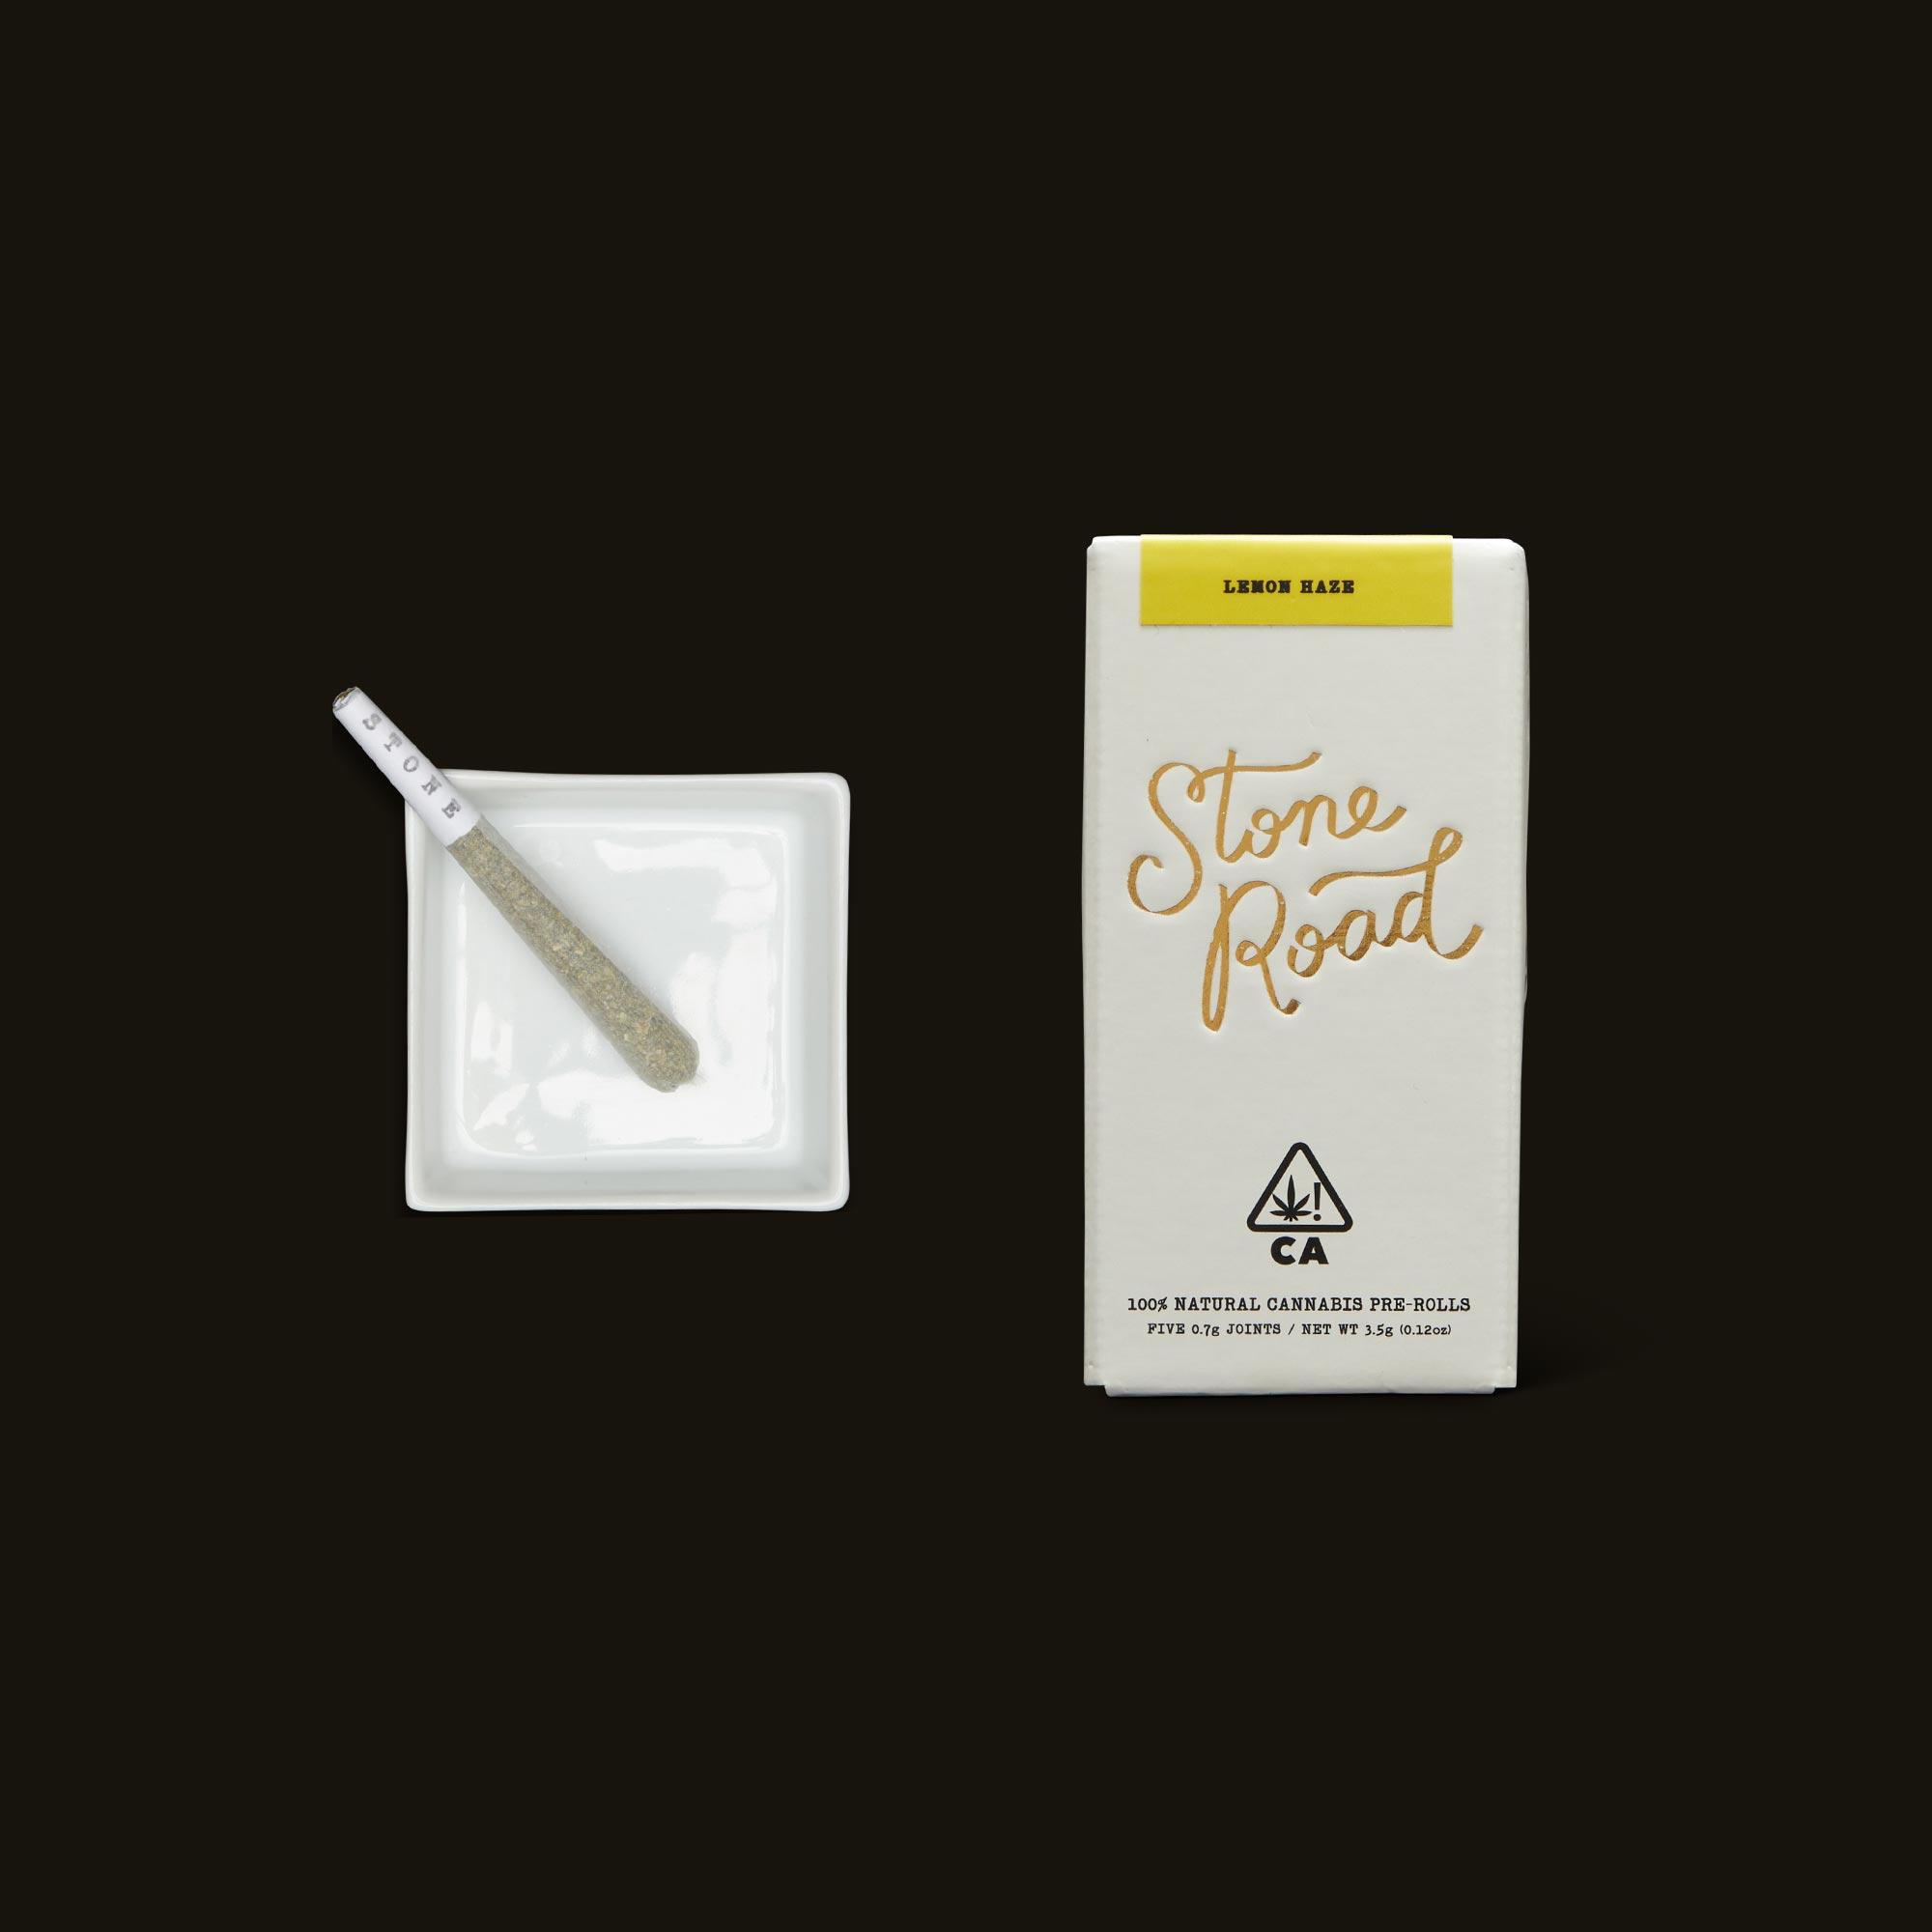 Stone Road Lemon Haze Infused Pre-Roll Pack